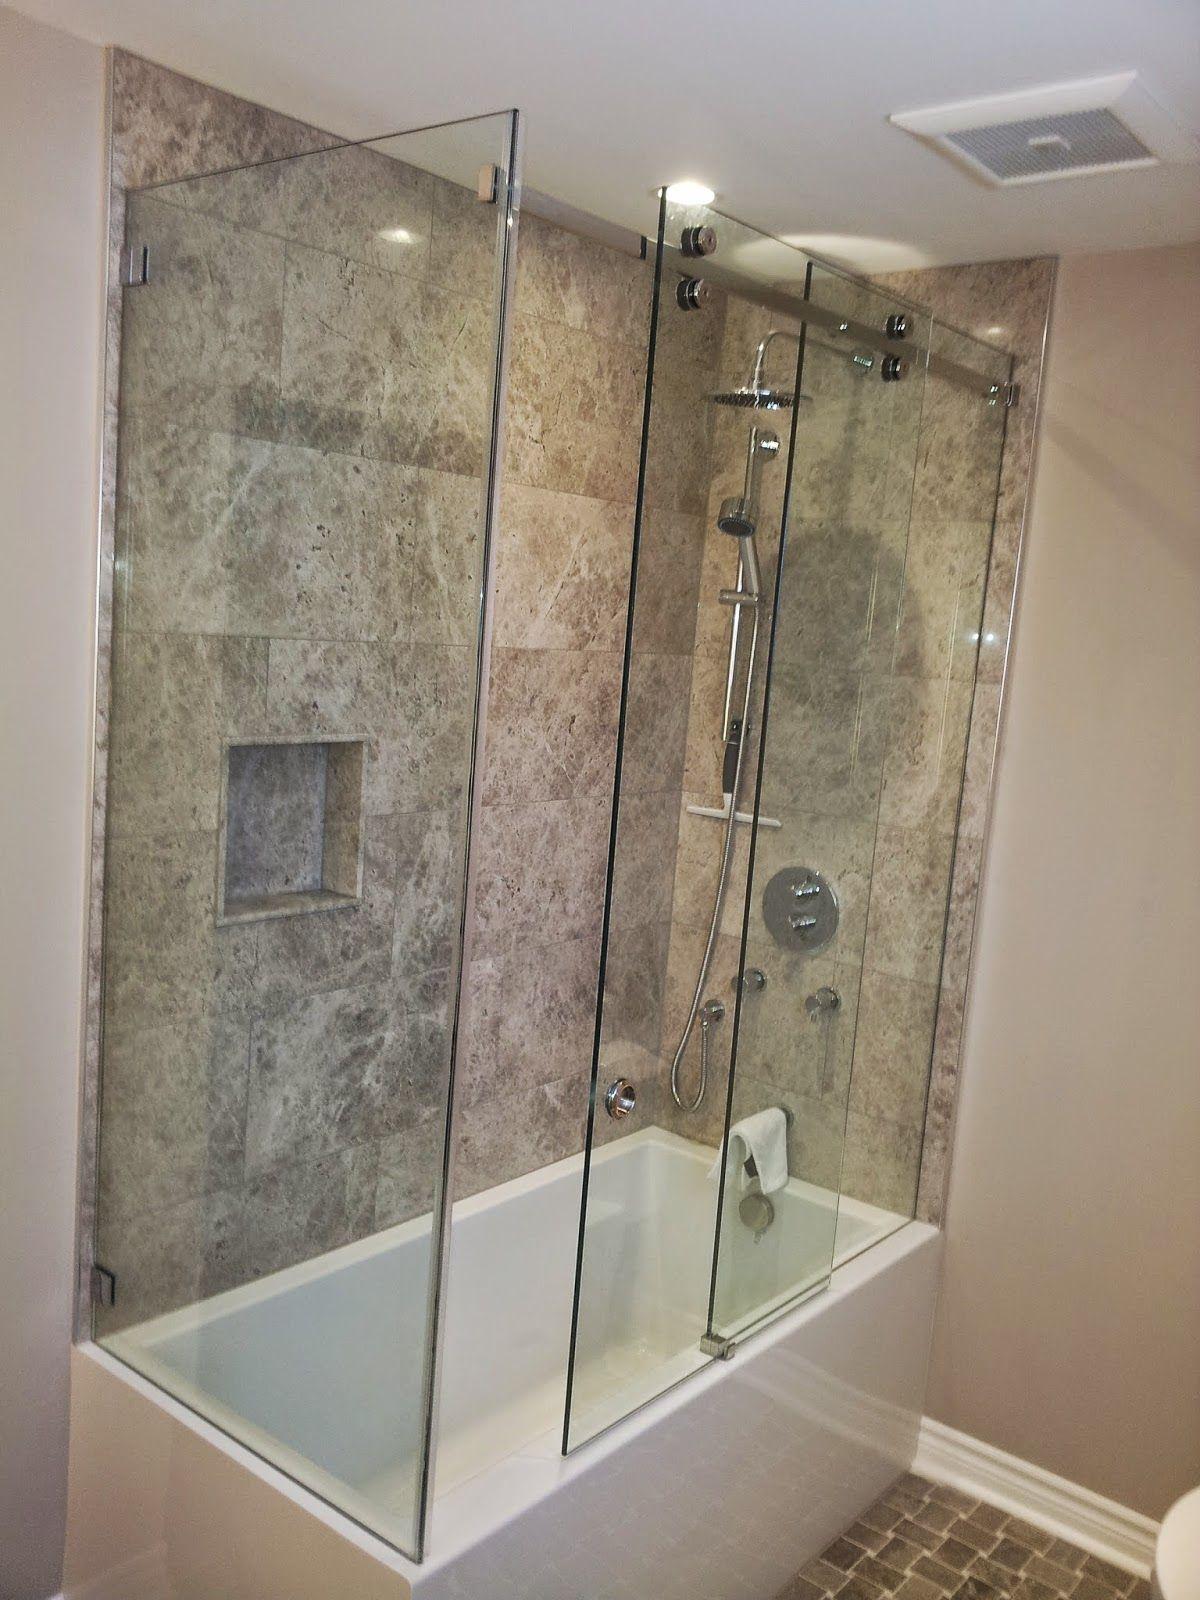 Bathroom Remodel Bathroom Remodel Before And After Bathroom Remodel Diy Bathroom Remodel Farmhouse B In 2020 Glass Shower Tub Glass Tub Enclosure Shower Enclosure